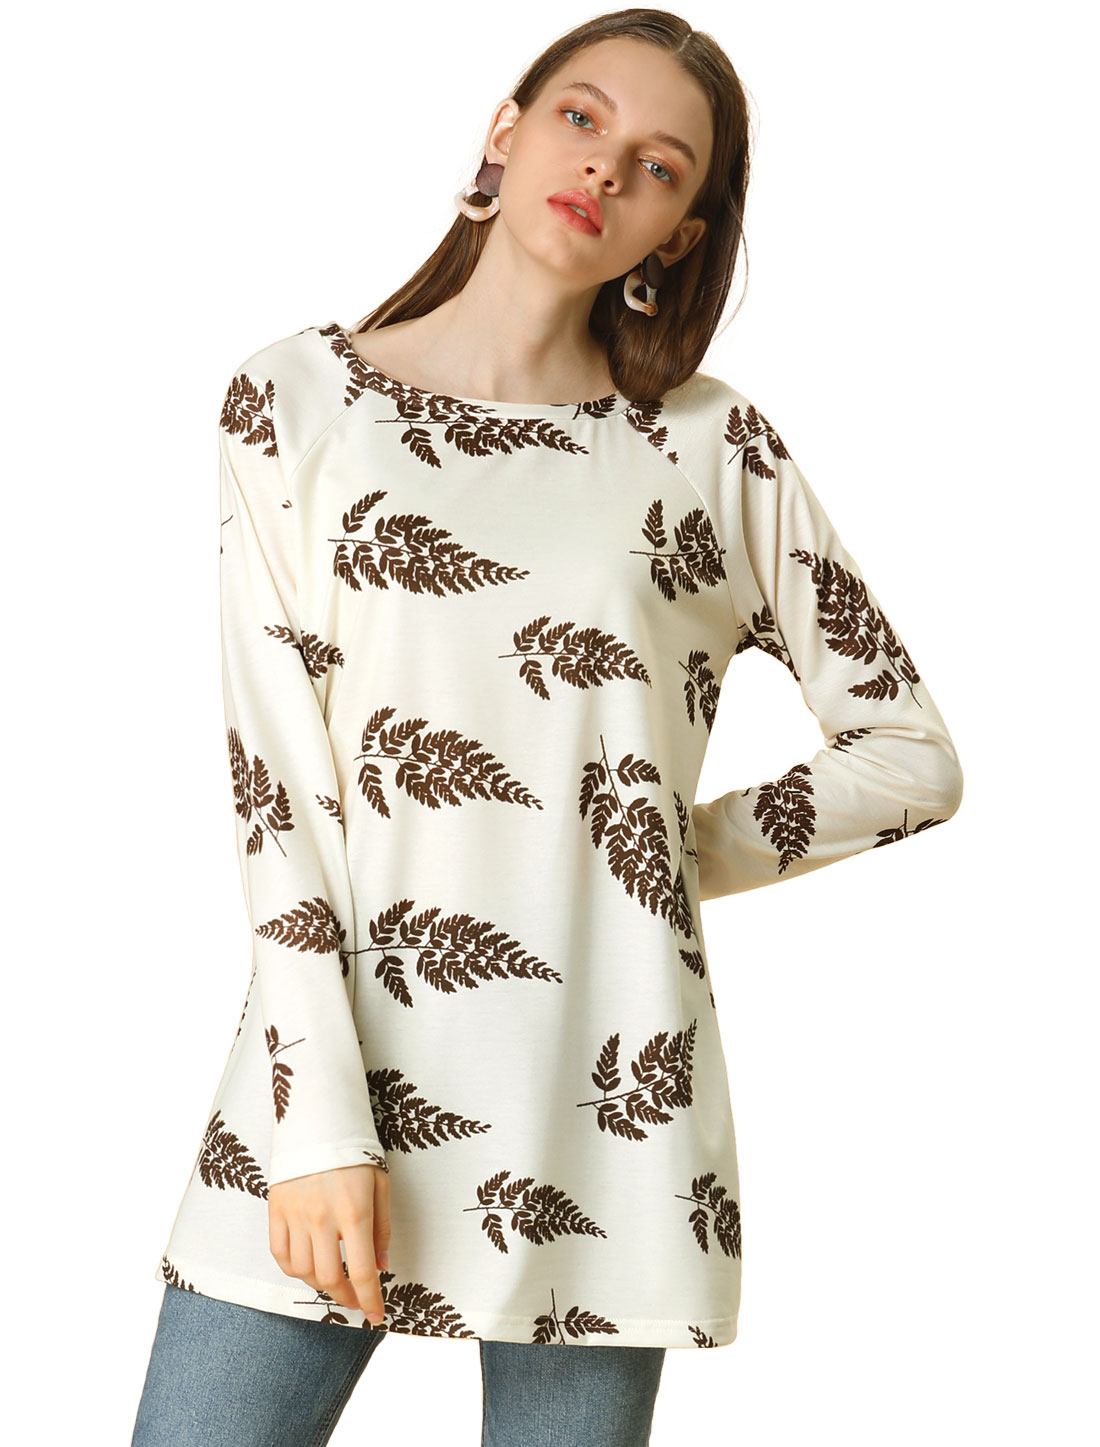 Allegra K Women's Leaf Print Raglan Long Sleeve Round Neck Crem White XS (US 2)